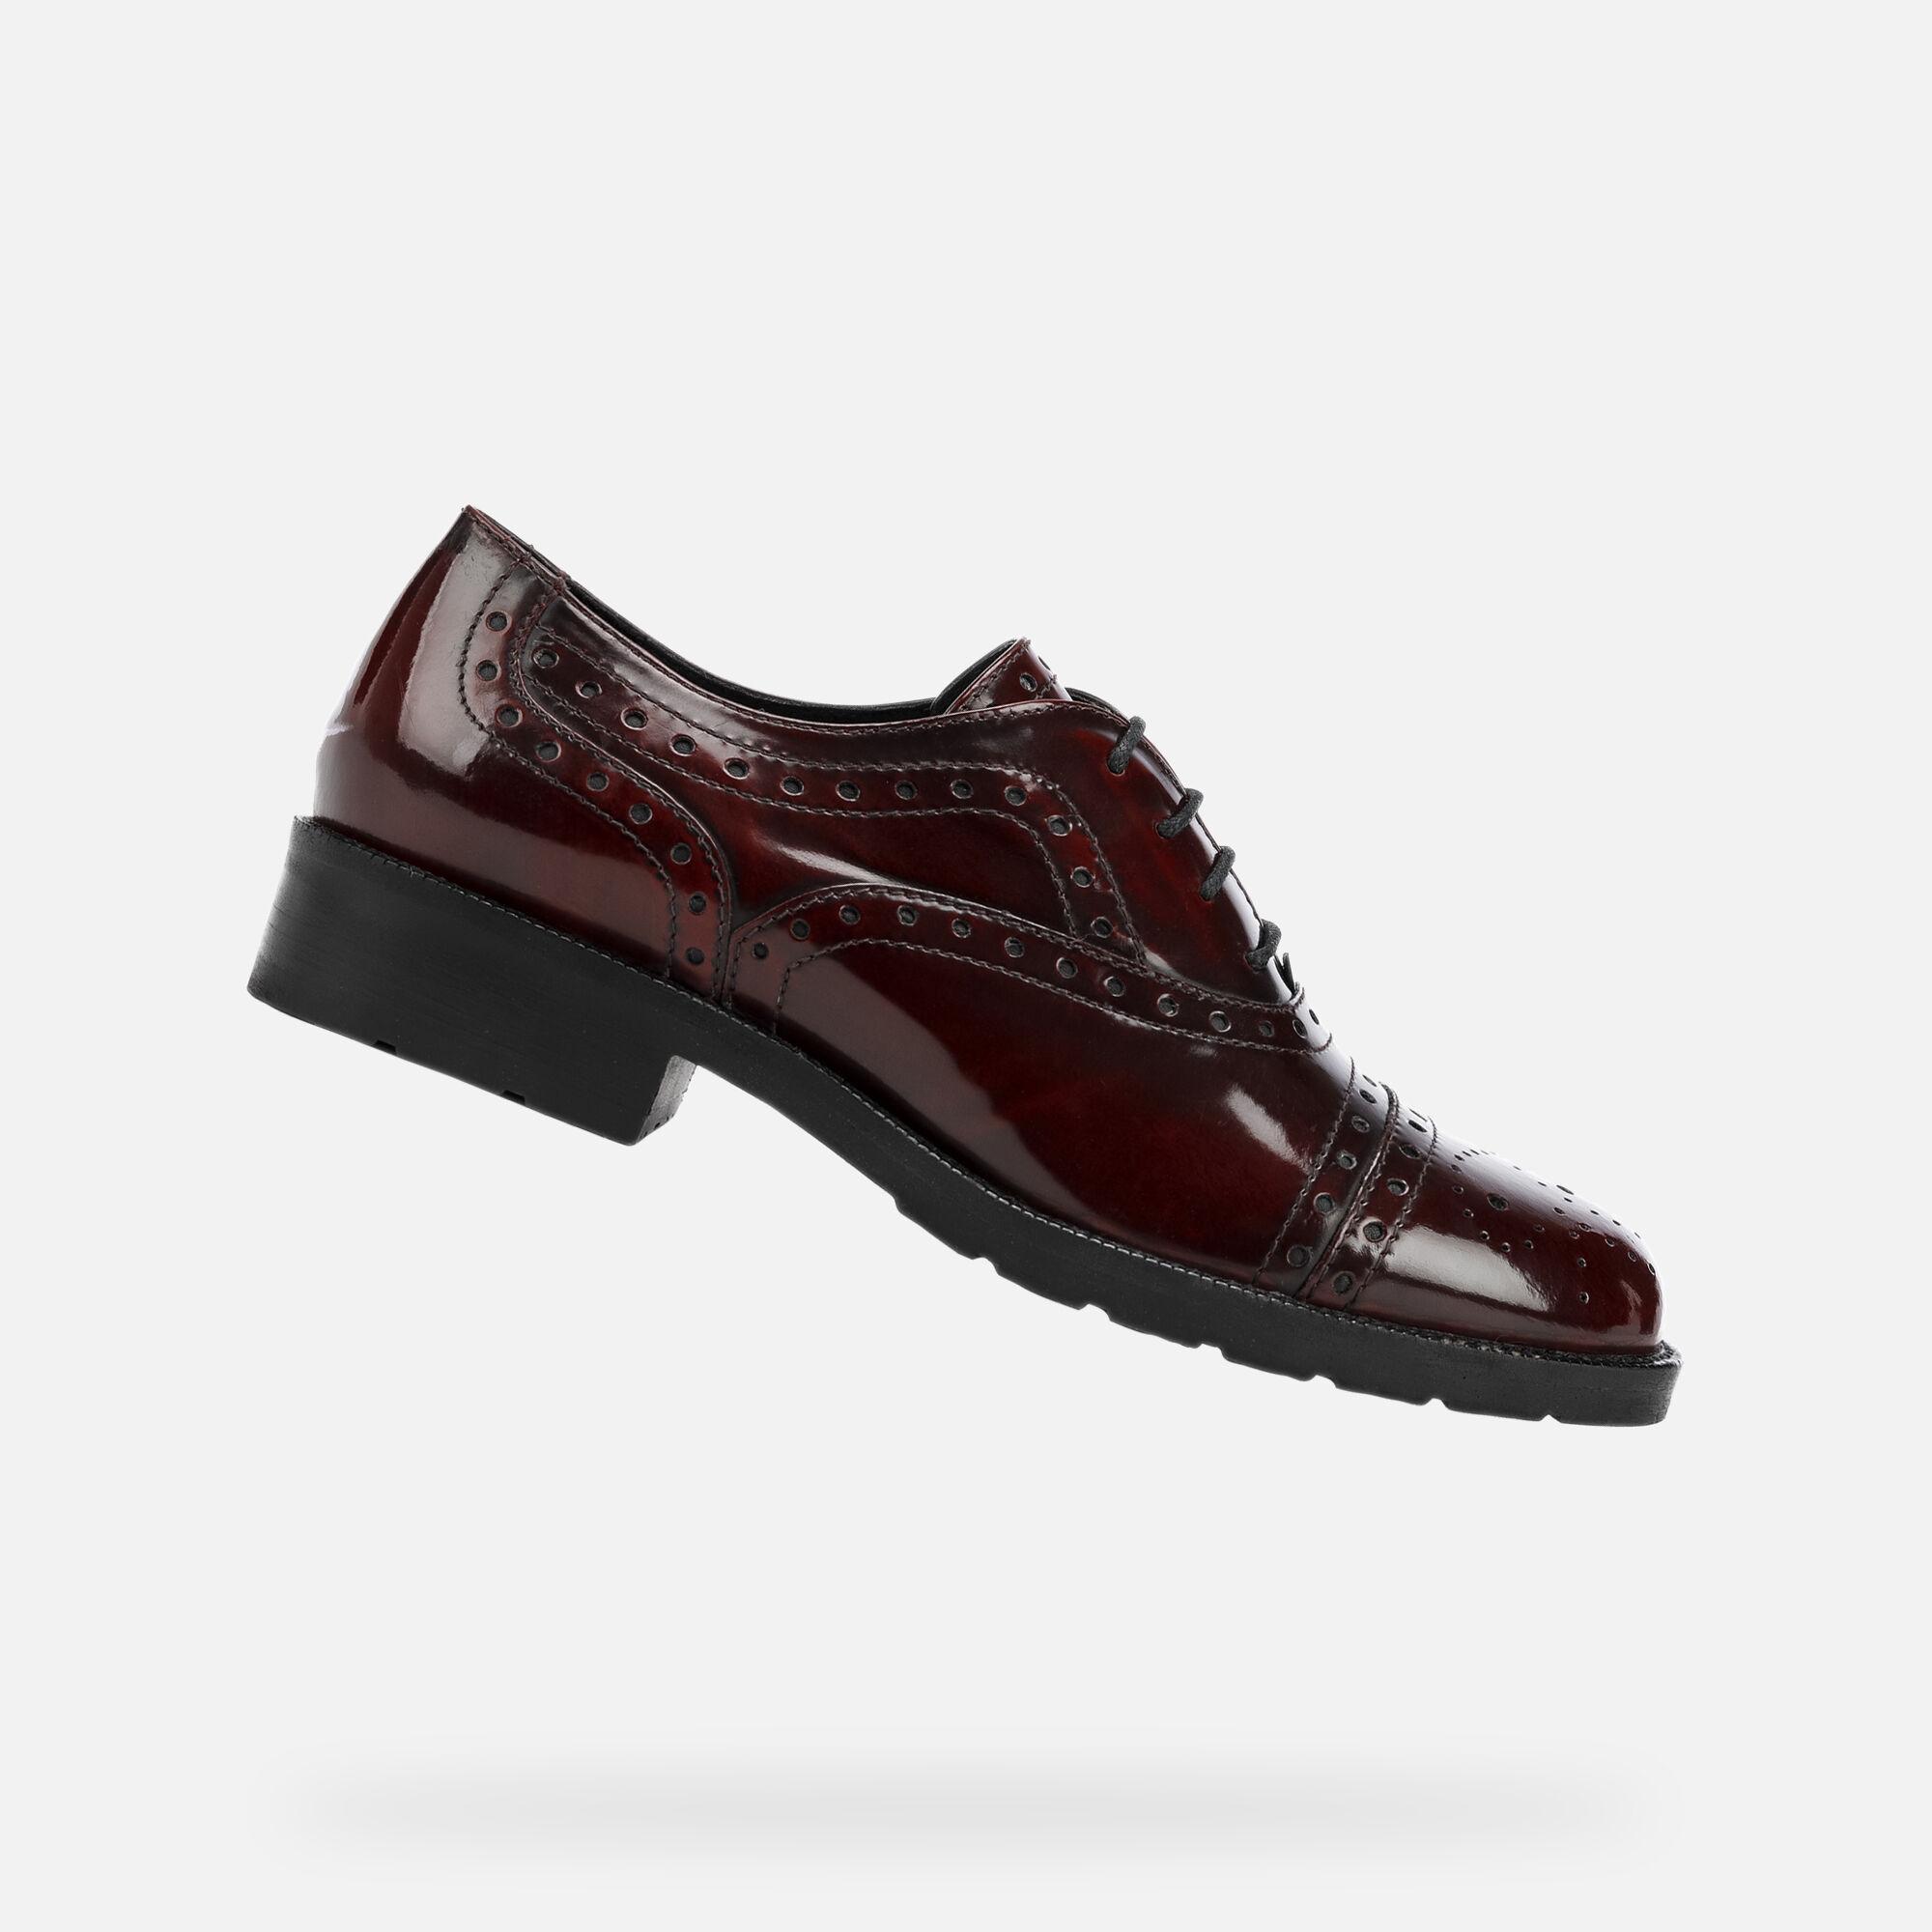 geox chaussures femme site officiel